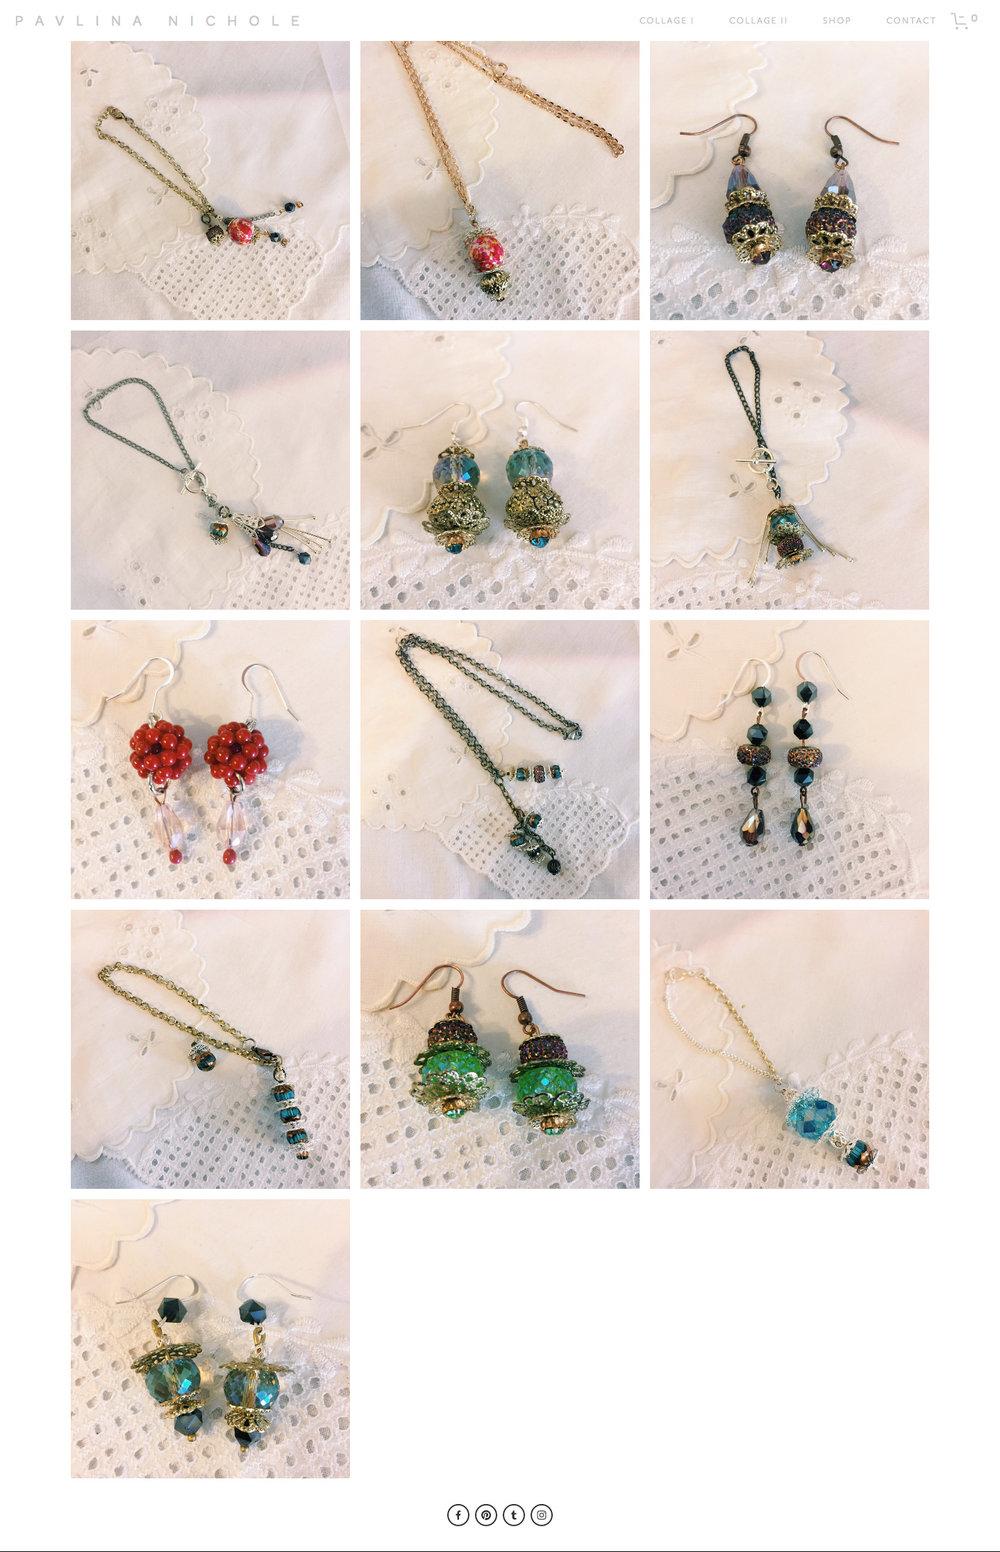 pavi_jewelry.jpg